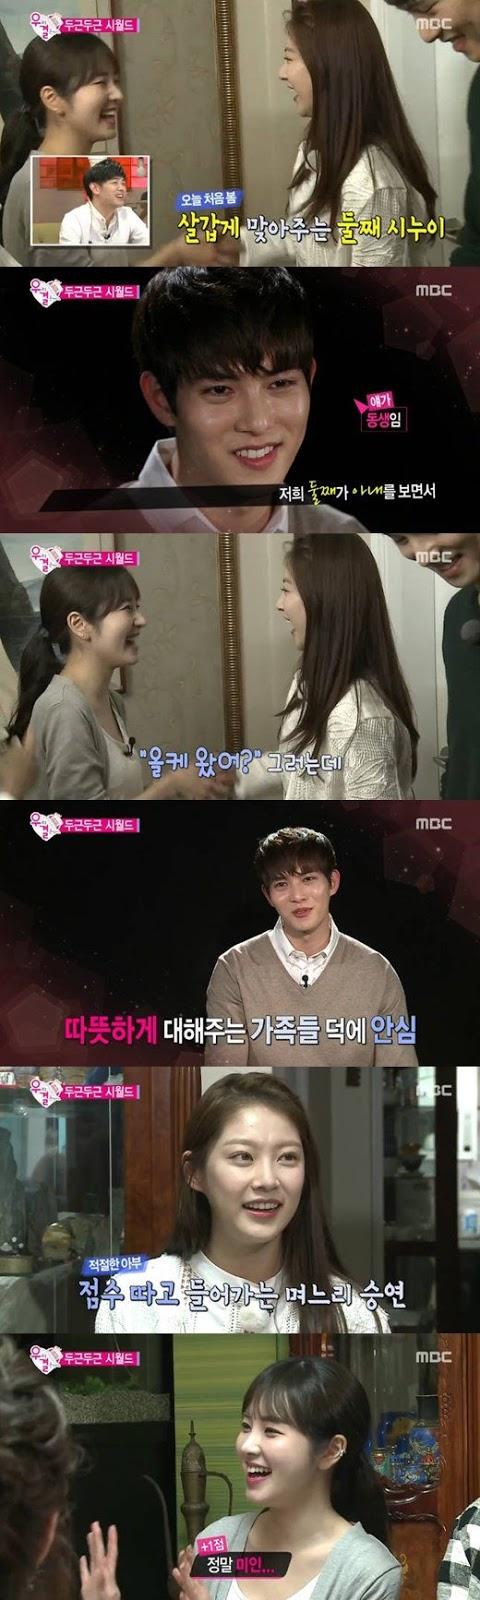 [NET�ZEN] Jonghyun �WGM�de Gong Seung Yeon�la Ablas�n� tan��t�rd�